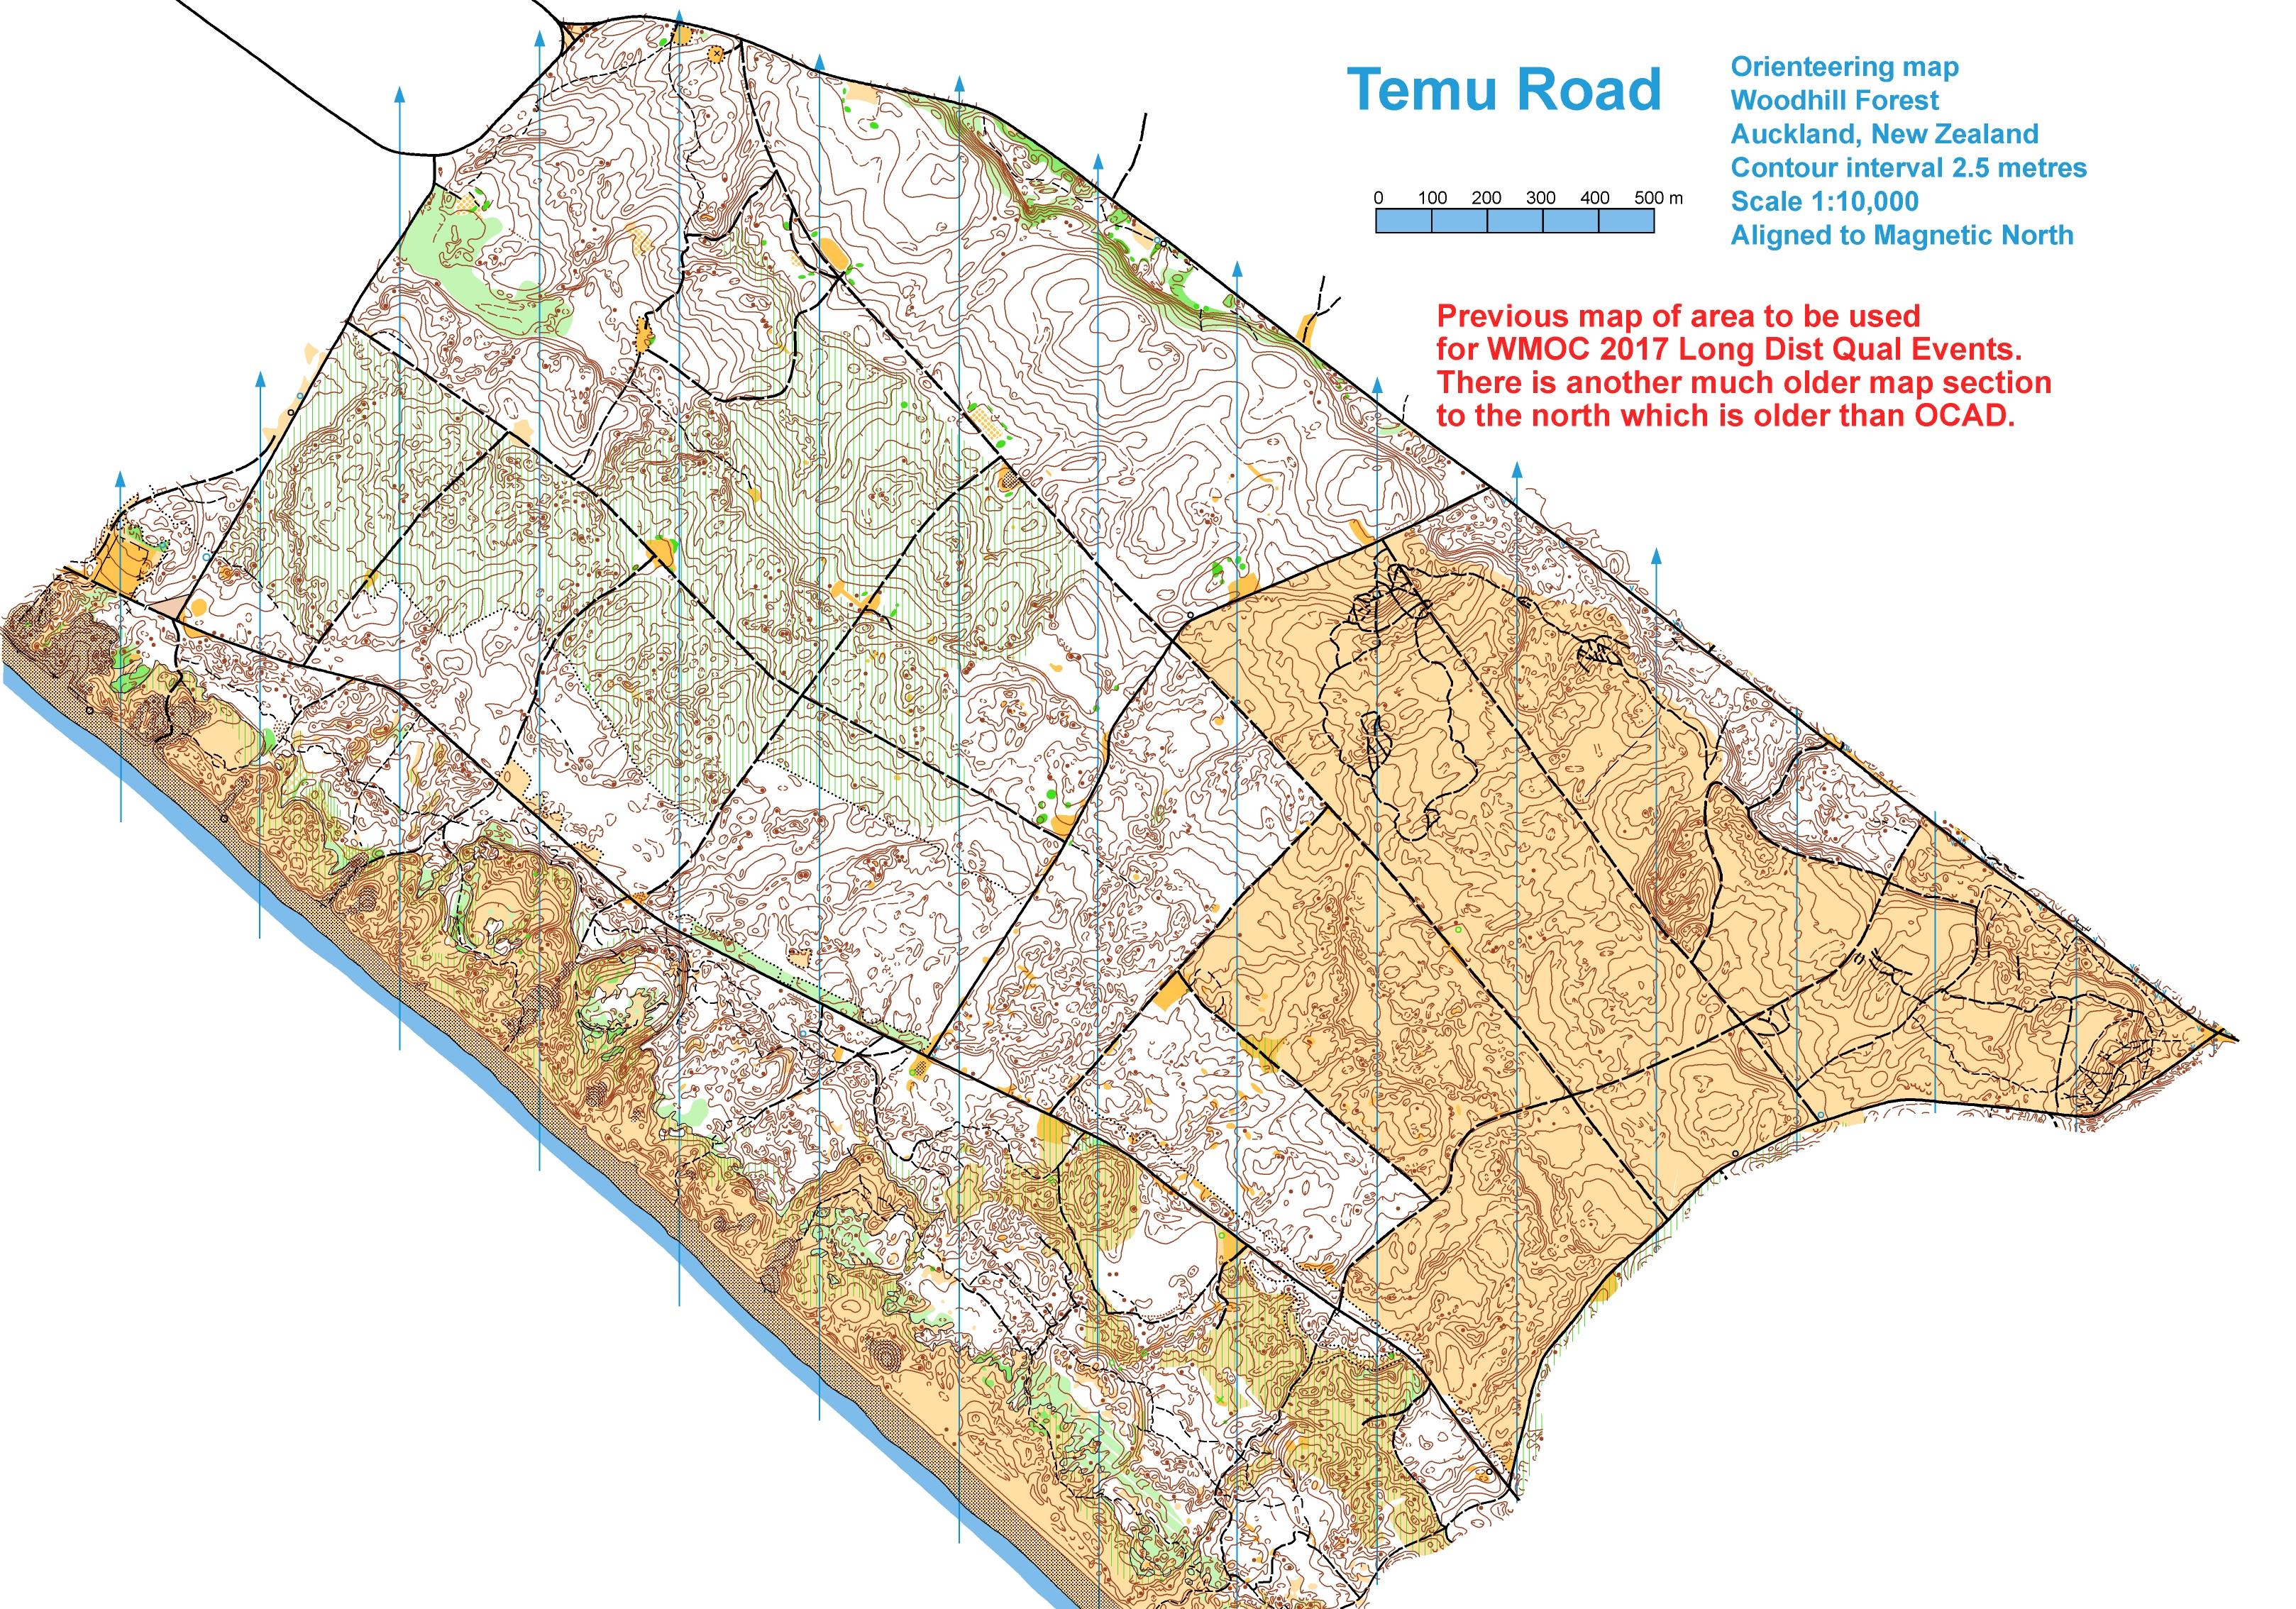 World masters games 2017 world masters orienteering wmoc2017 old maps longdistqual woodhill temu rd biocorpaavc